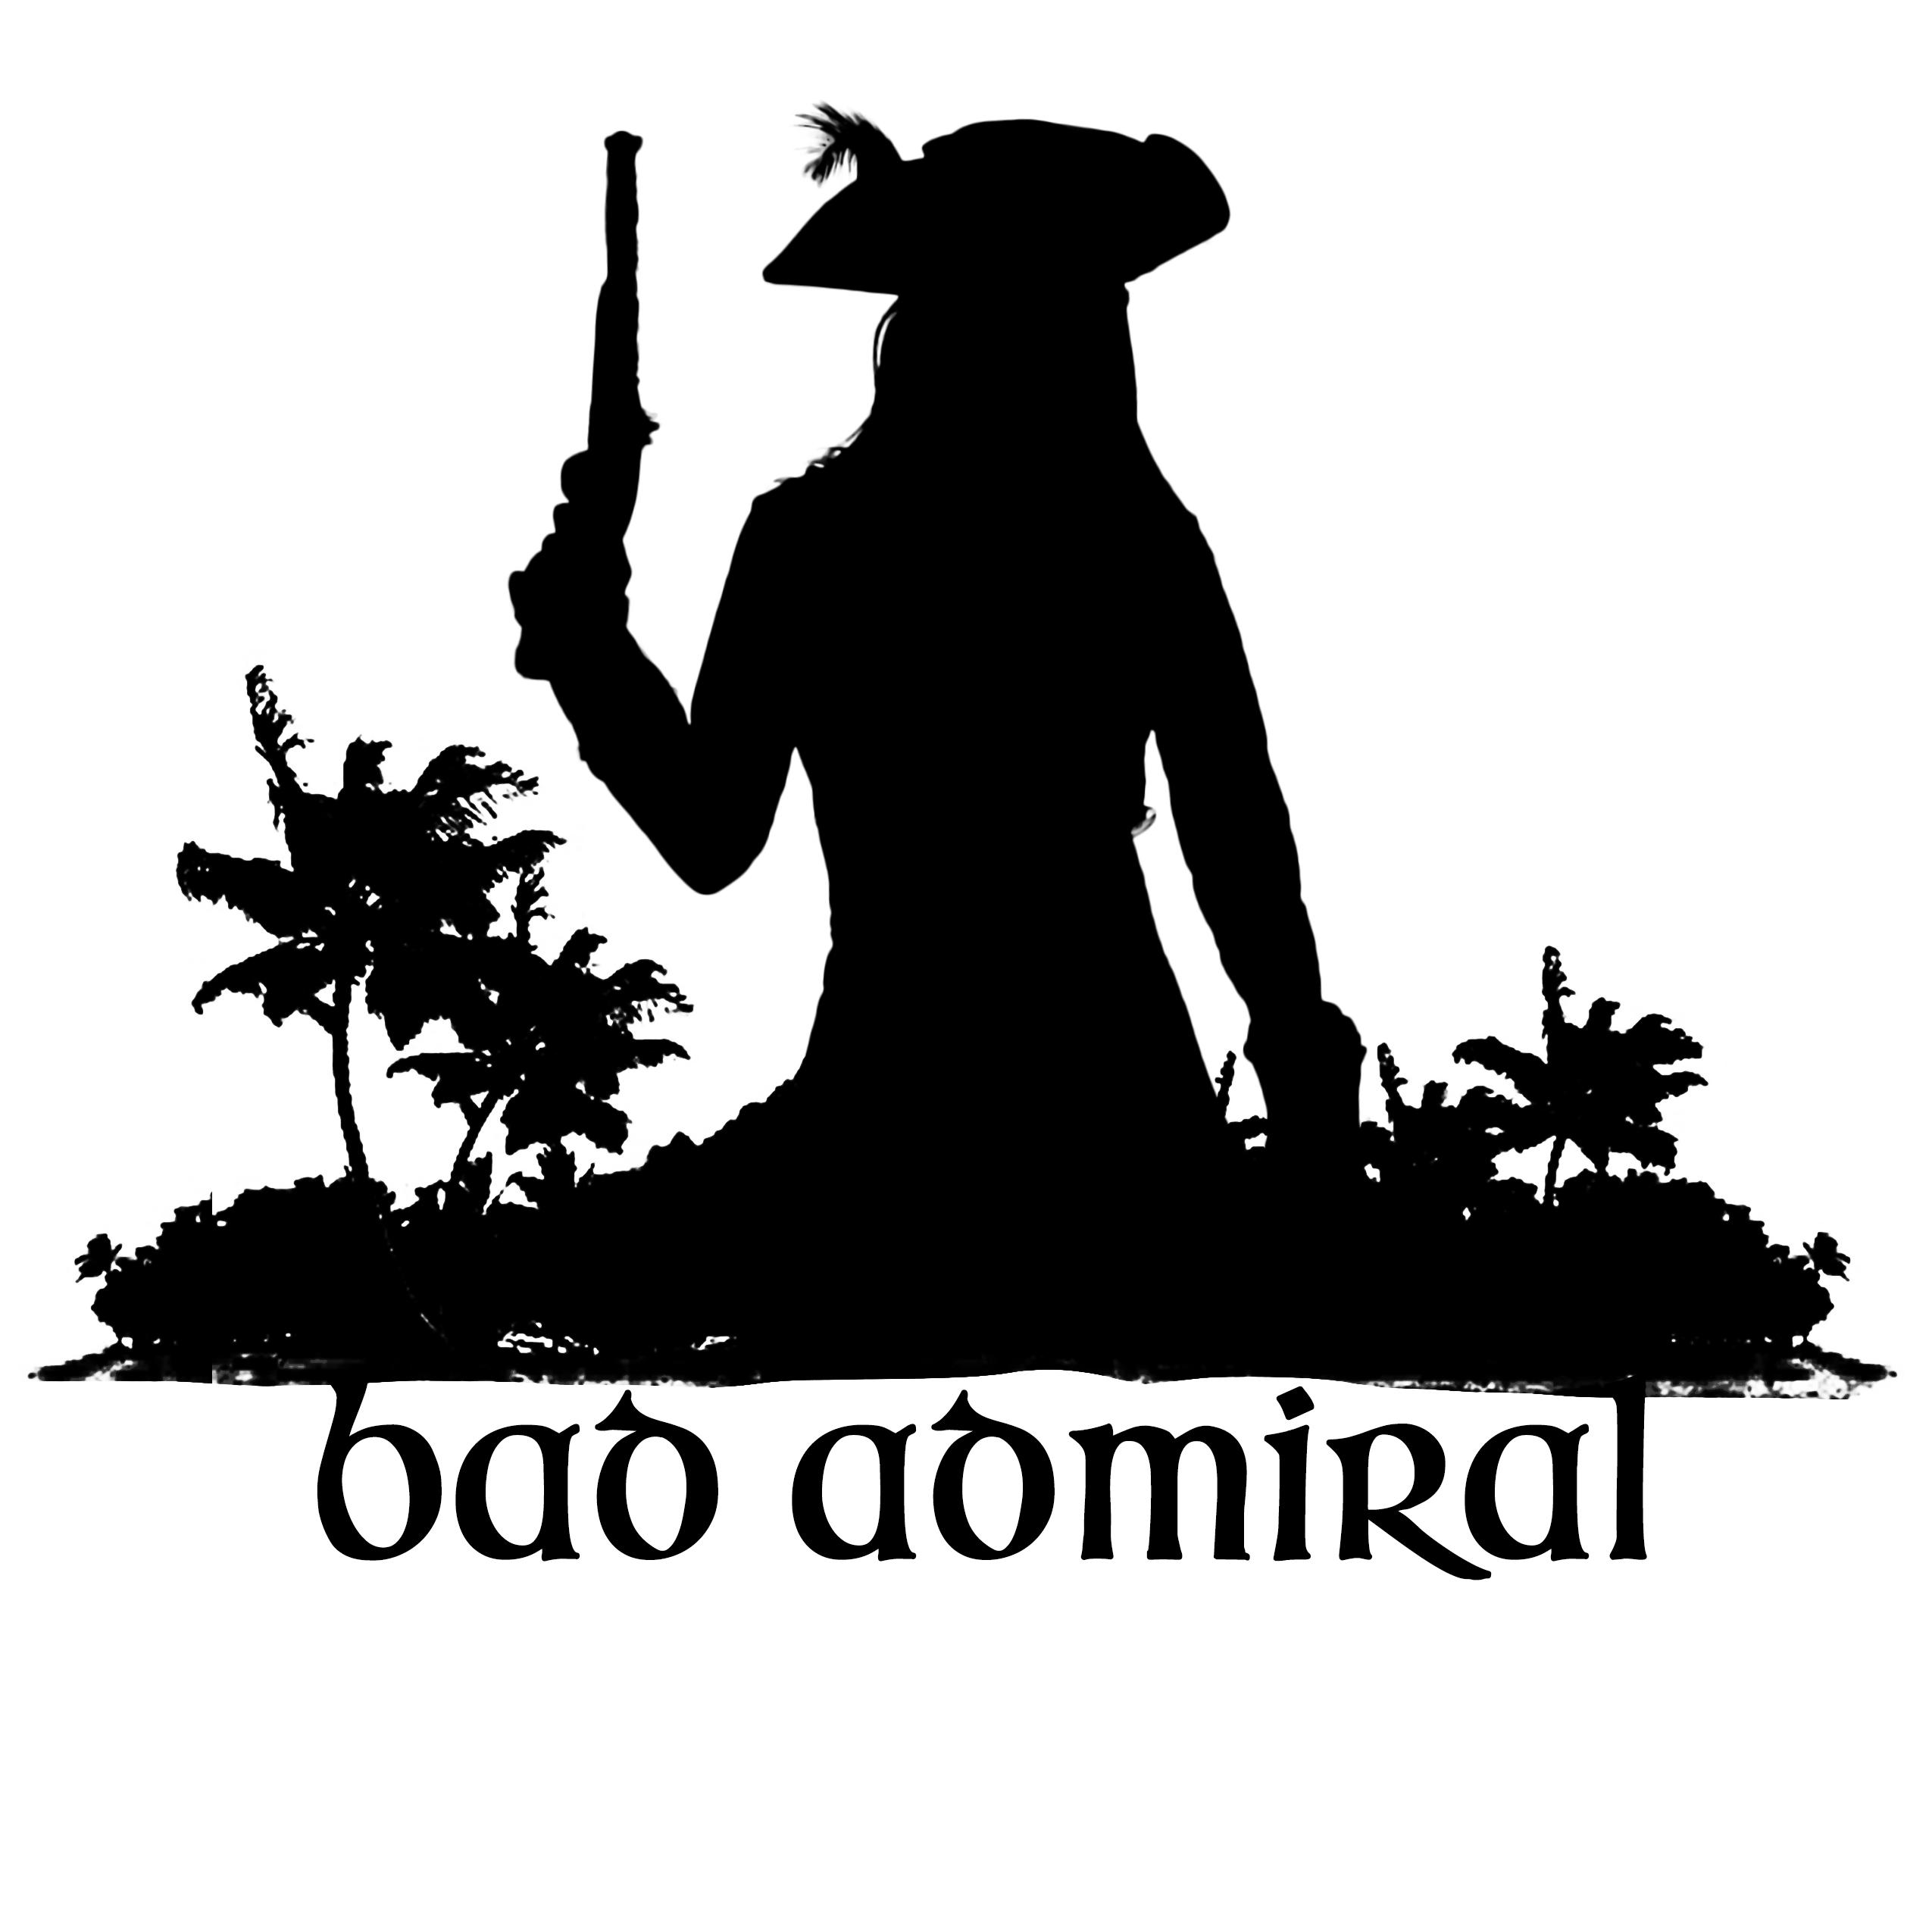 Bad Admiral